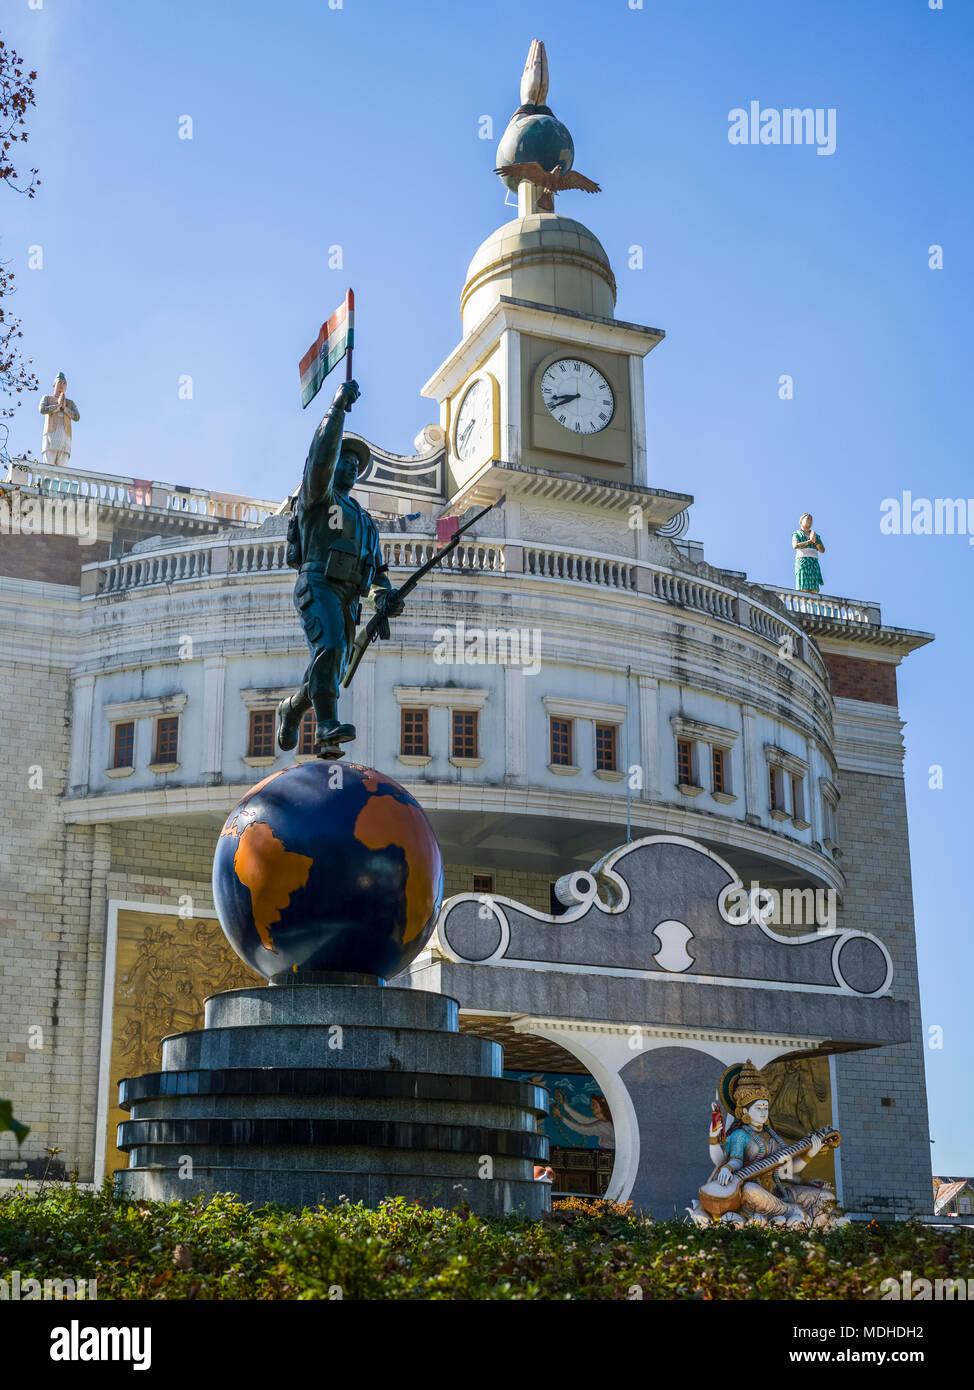 Bhanu Bhawan, Local Government Office; Darjeeling, West Bengal, India - Stock Image